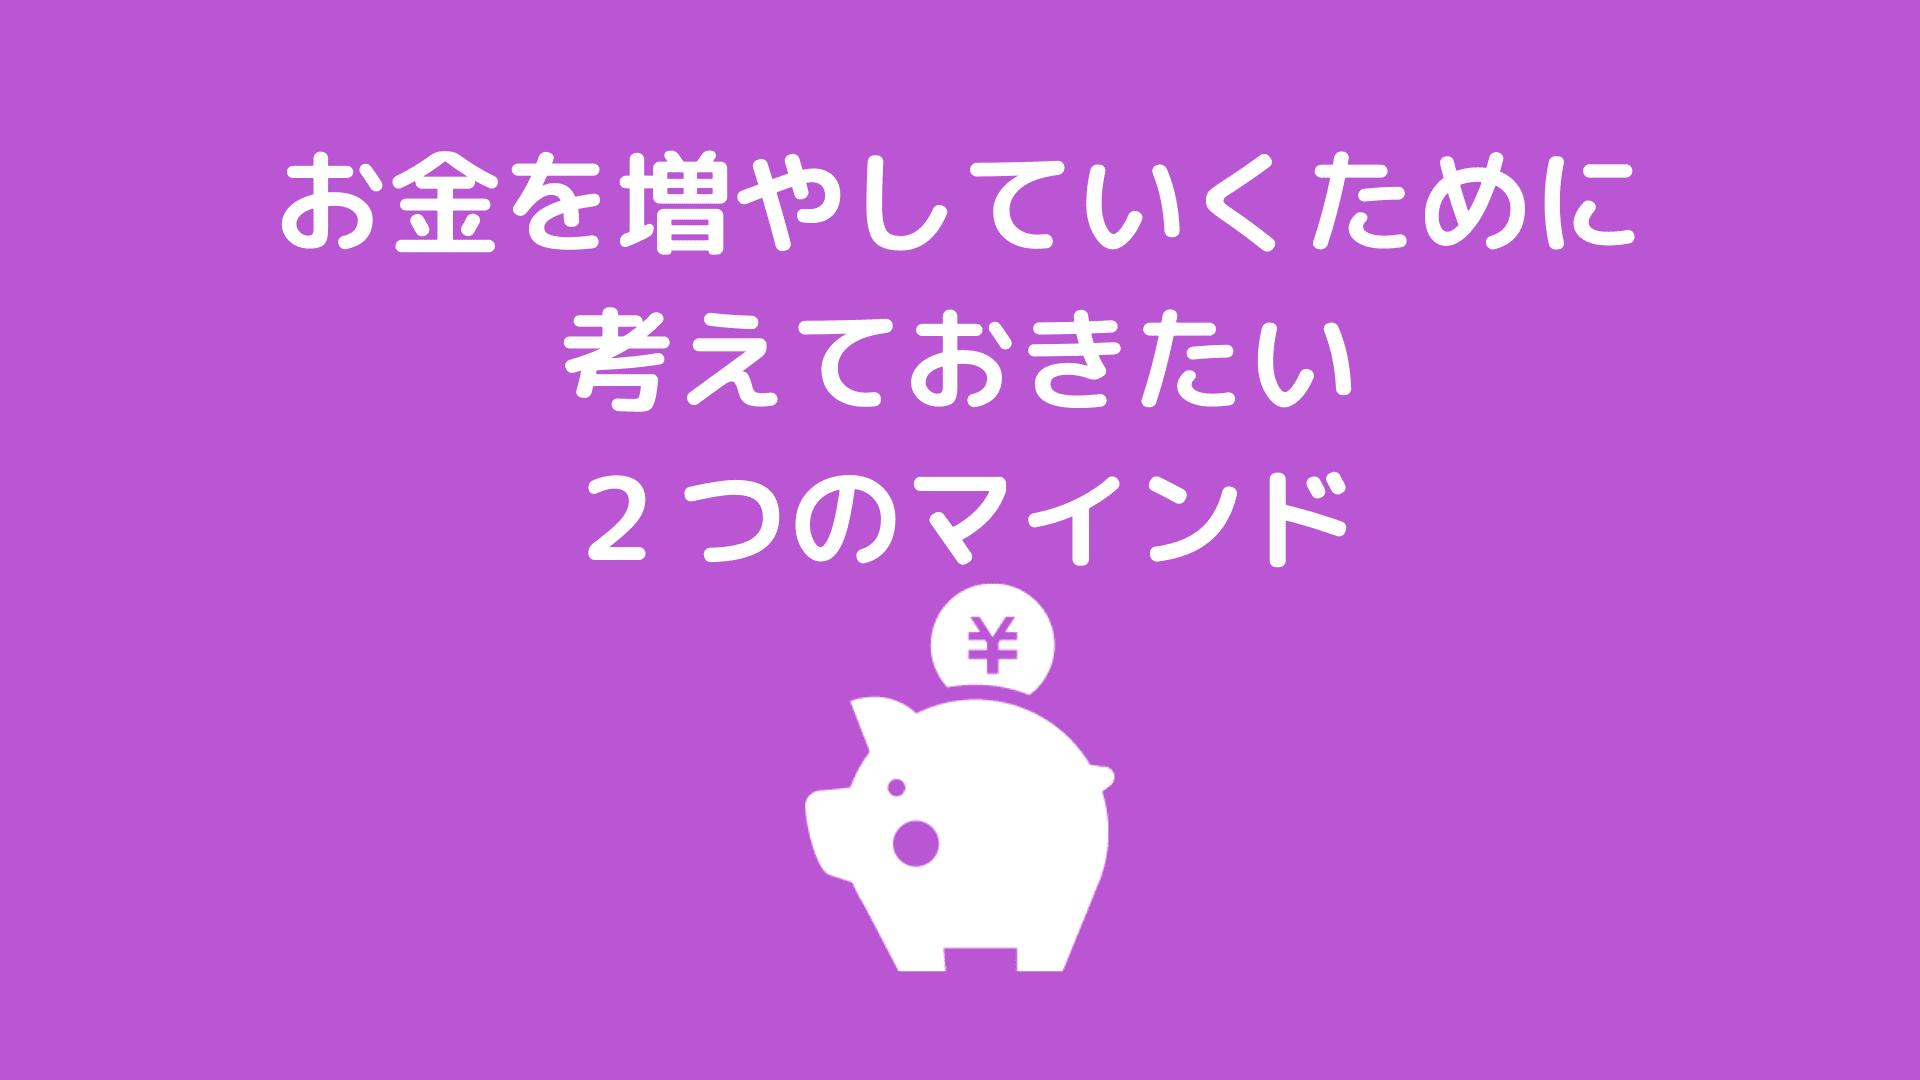 0001 5137001561